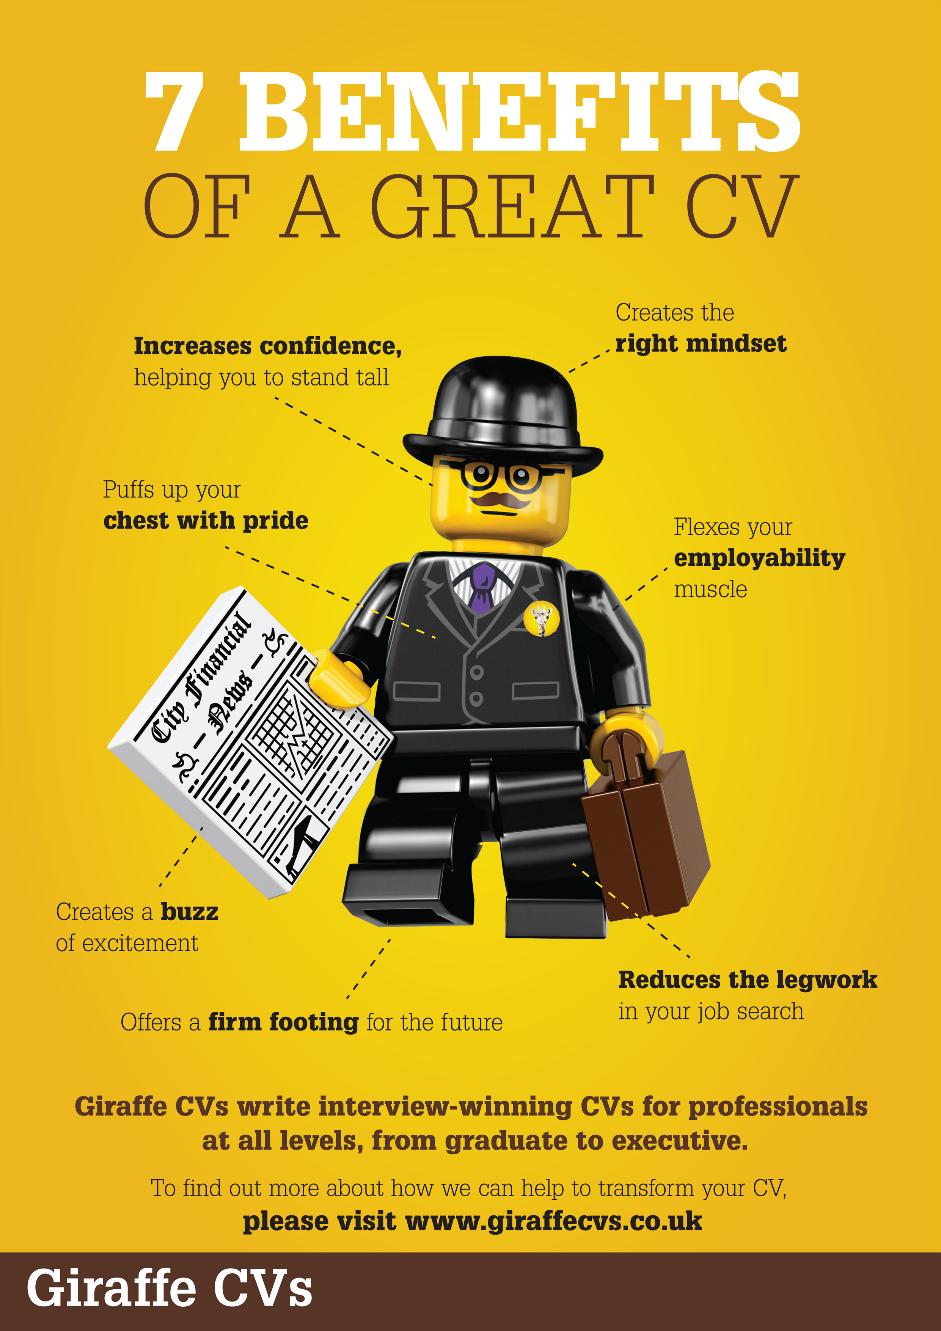 Professional cv writing uk reviews